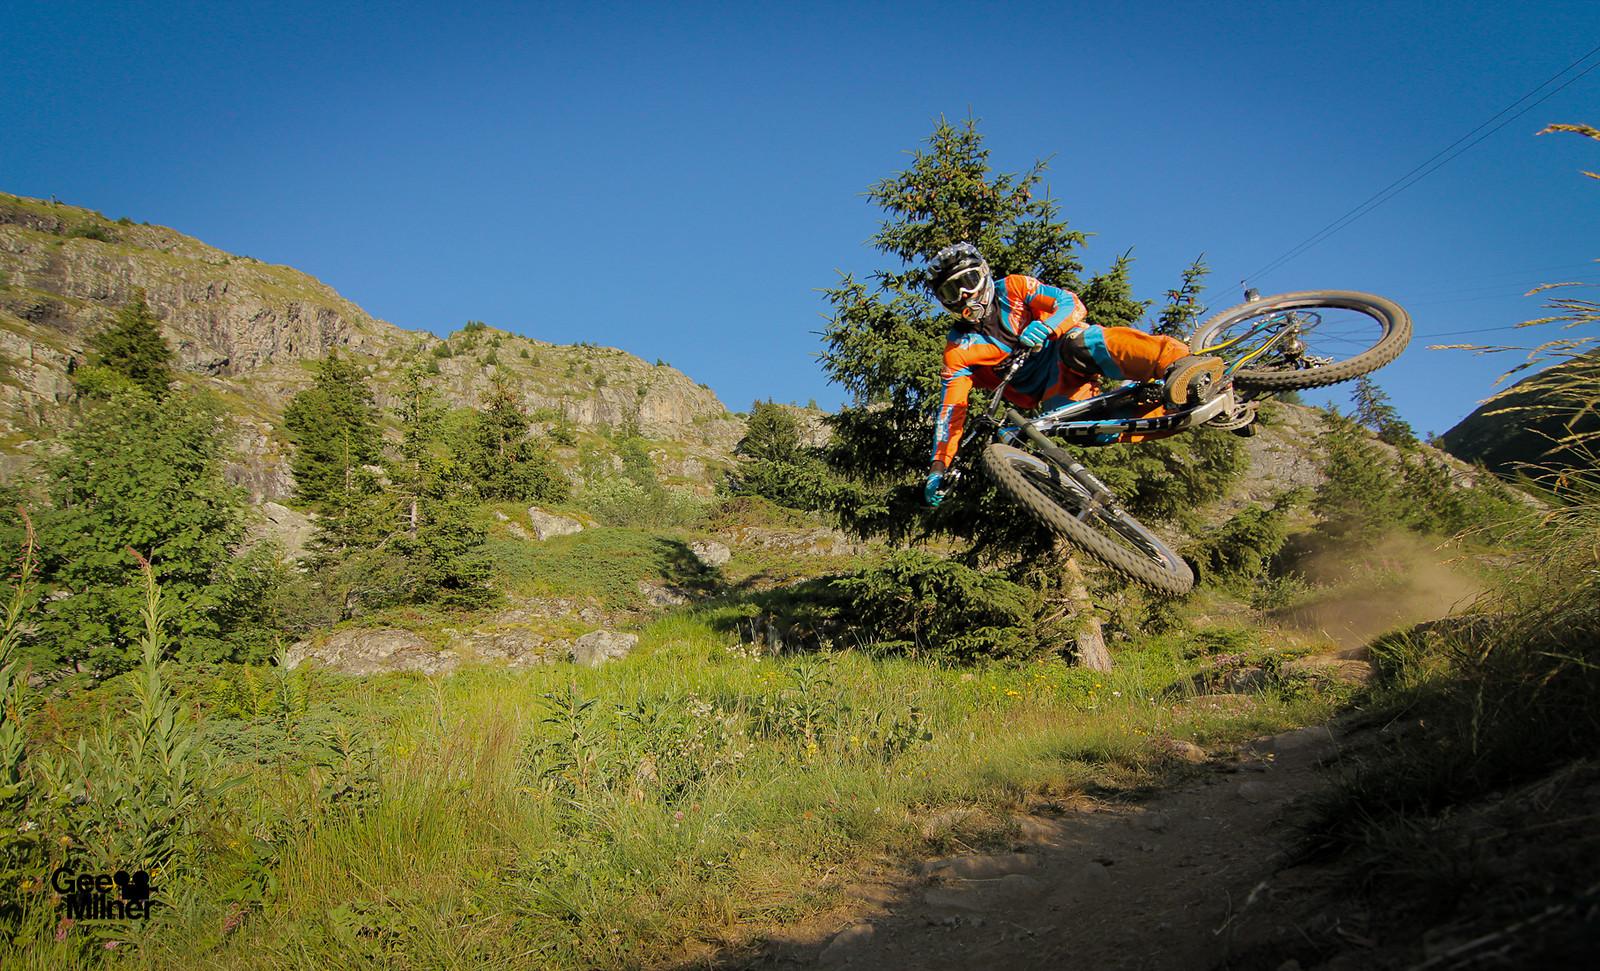 Ben Reid ripping it up  - Geemilnermedia - Mountain Biking Pictures - Vital MTB